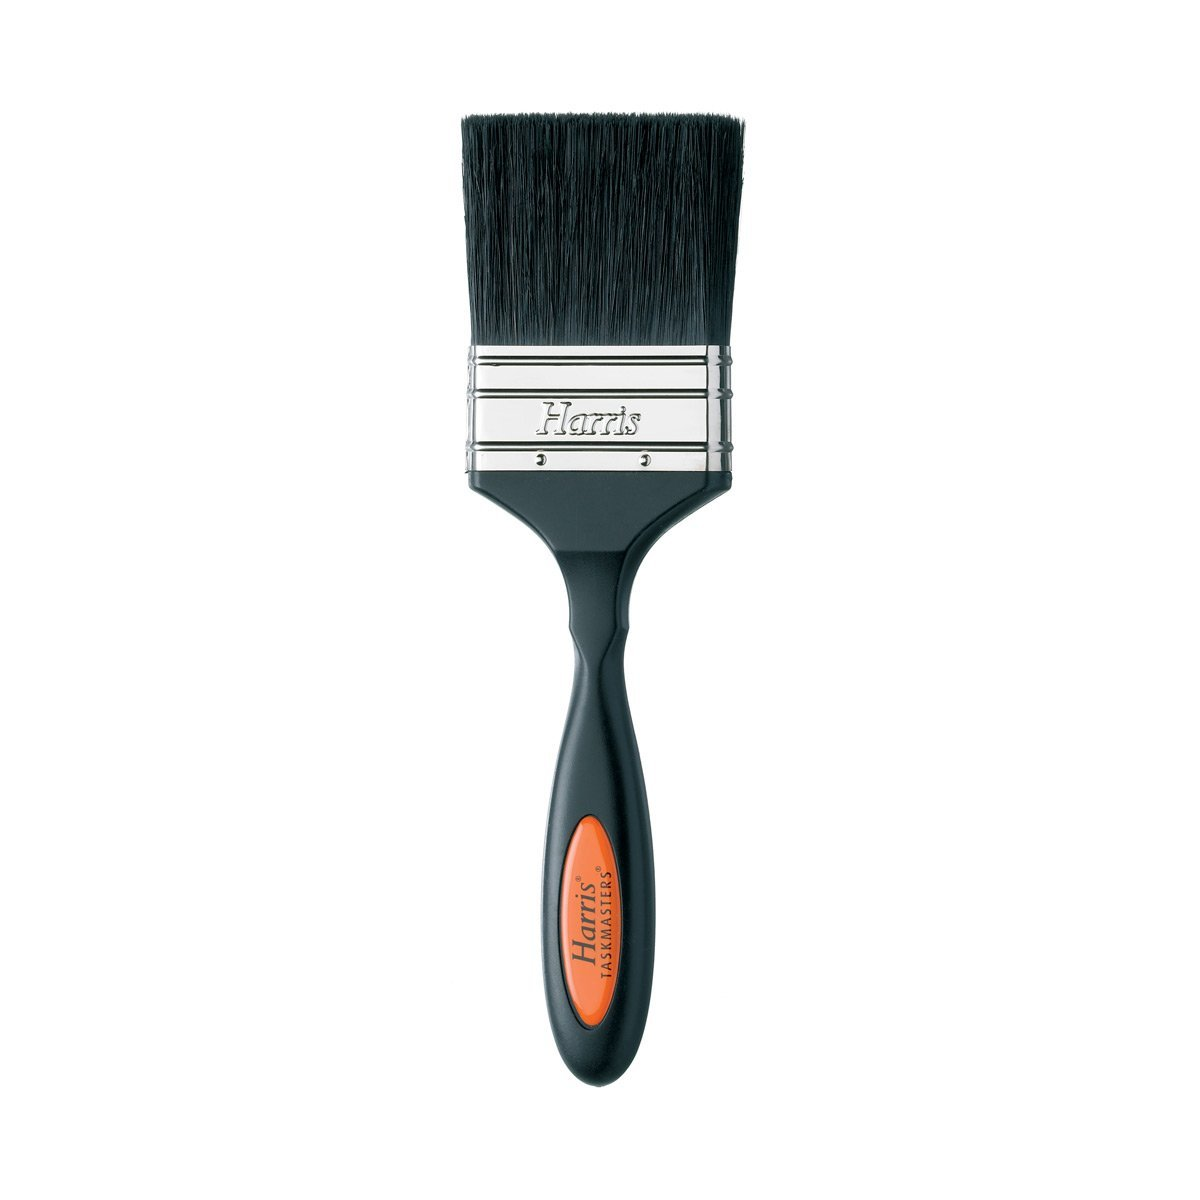 Кисть Harris brushes TASKMASTERS 63 мм/2,5 дюйма